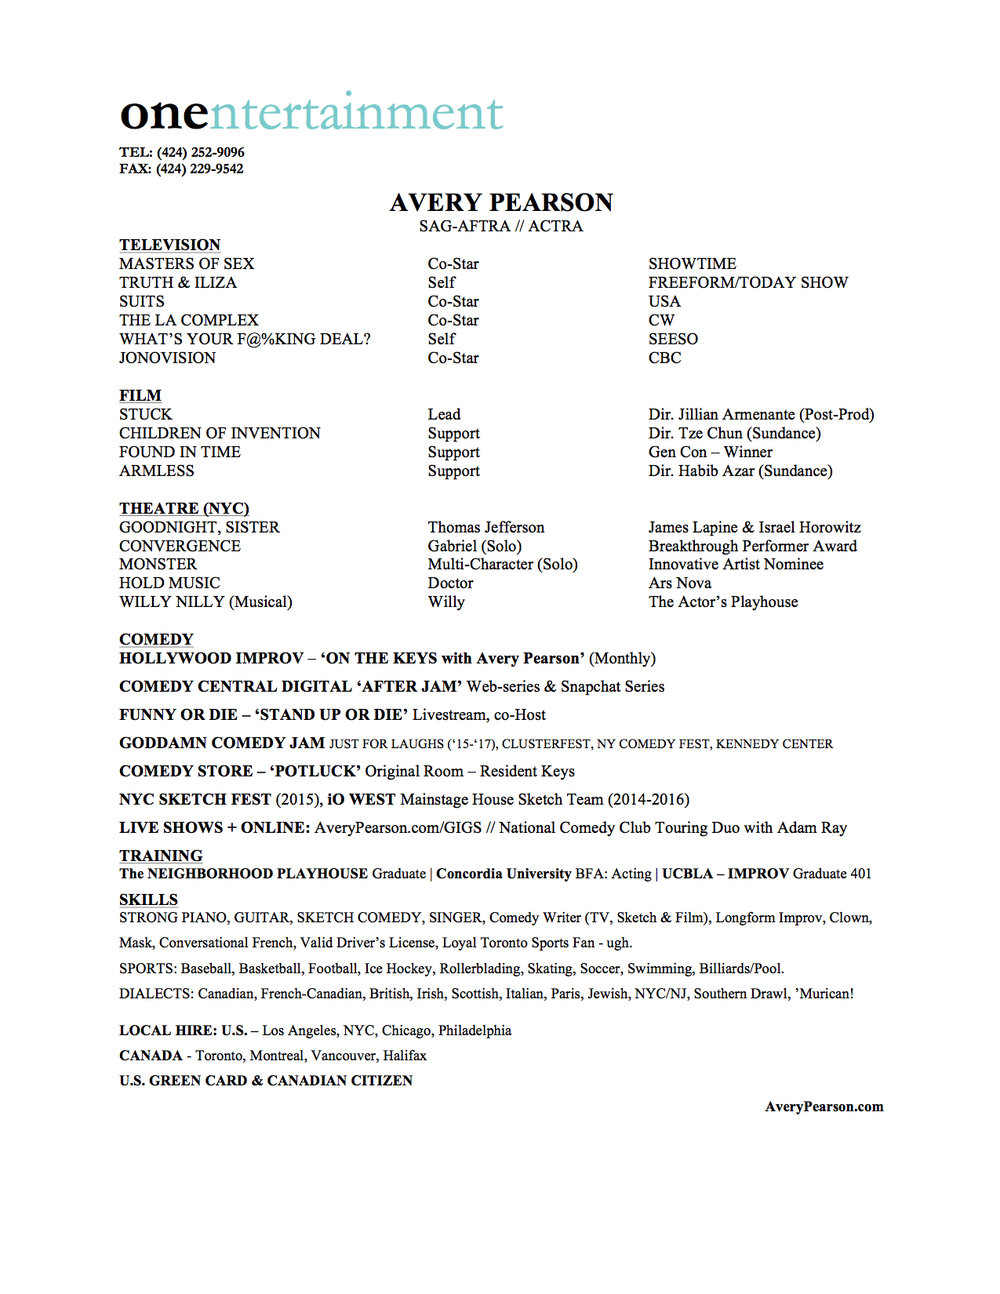 Avery Pearson - Resume 2017